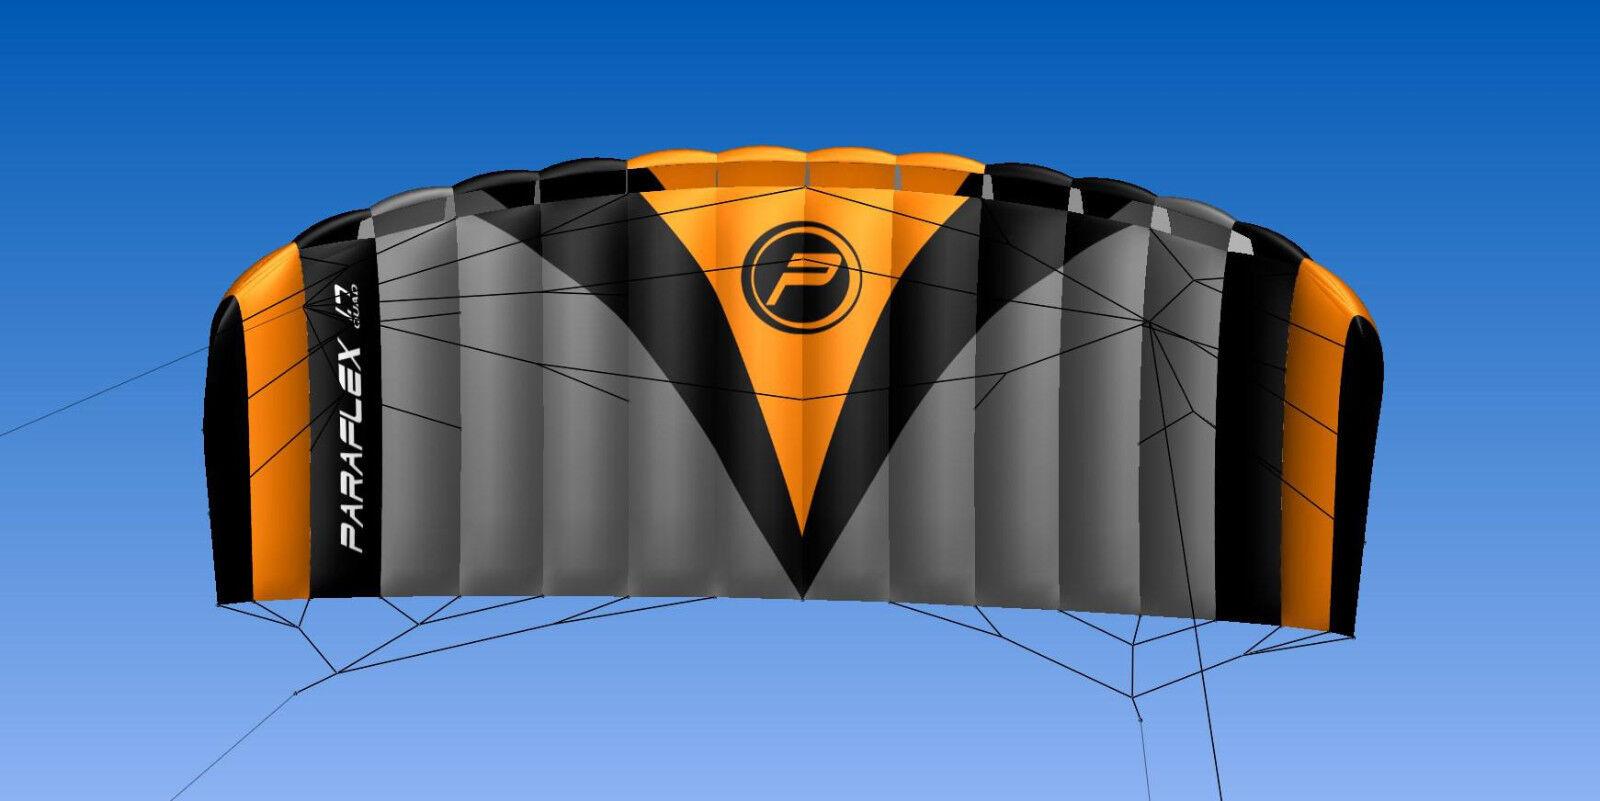 PARAFLEX PARAFLEX PARAFLEX QUAD 1.7  Wolkenstürmer Kite Lenkdrachen Actionkite Lenkmatte fe5d9b